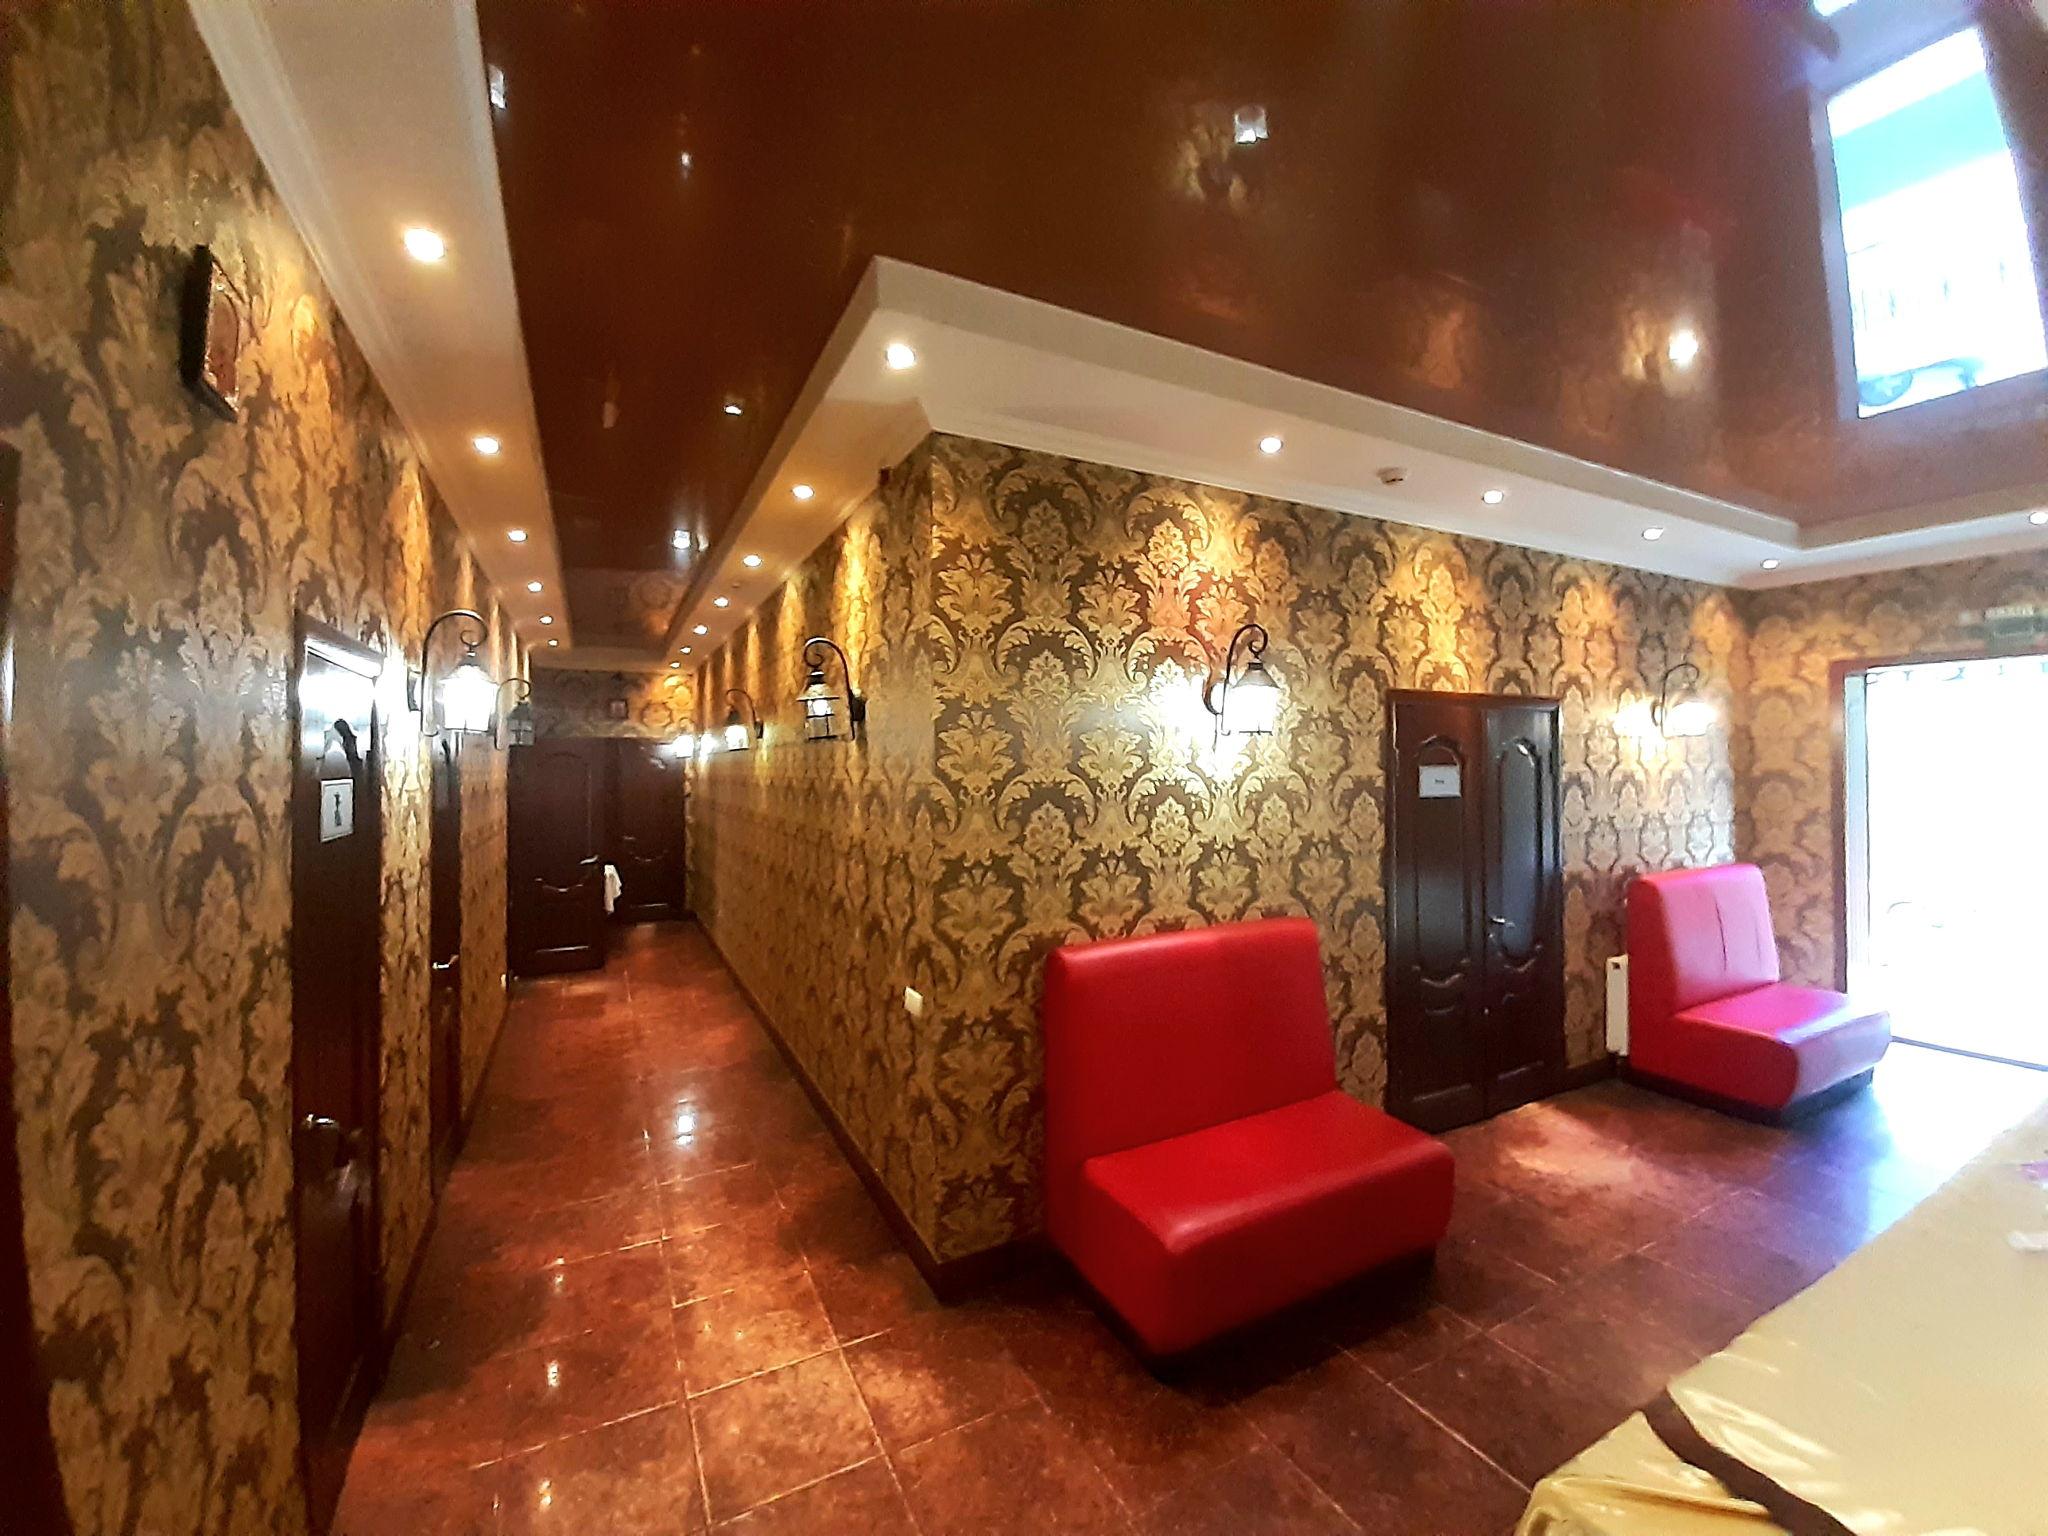 Ресторан, W-5563321, Чаадаева Петра, 2, Киев - Фото 1